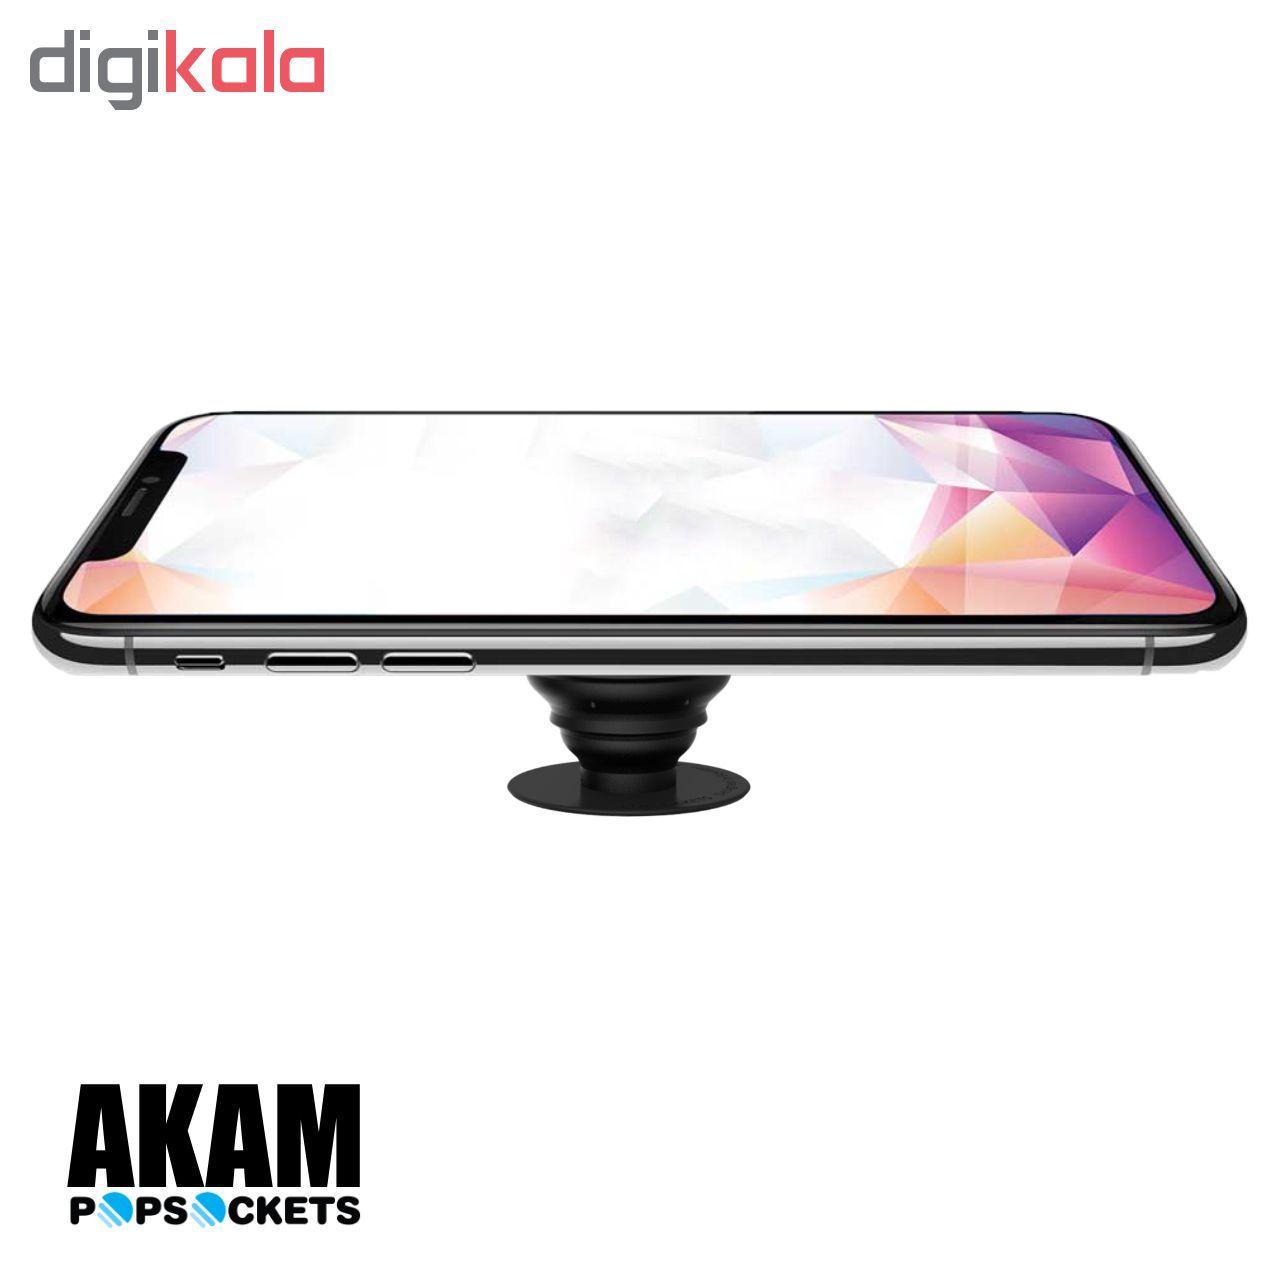 پایه نگهدارنده گوشی موبایل پاپ سوکت آکام مدل APS0033 main 1 9